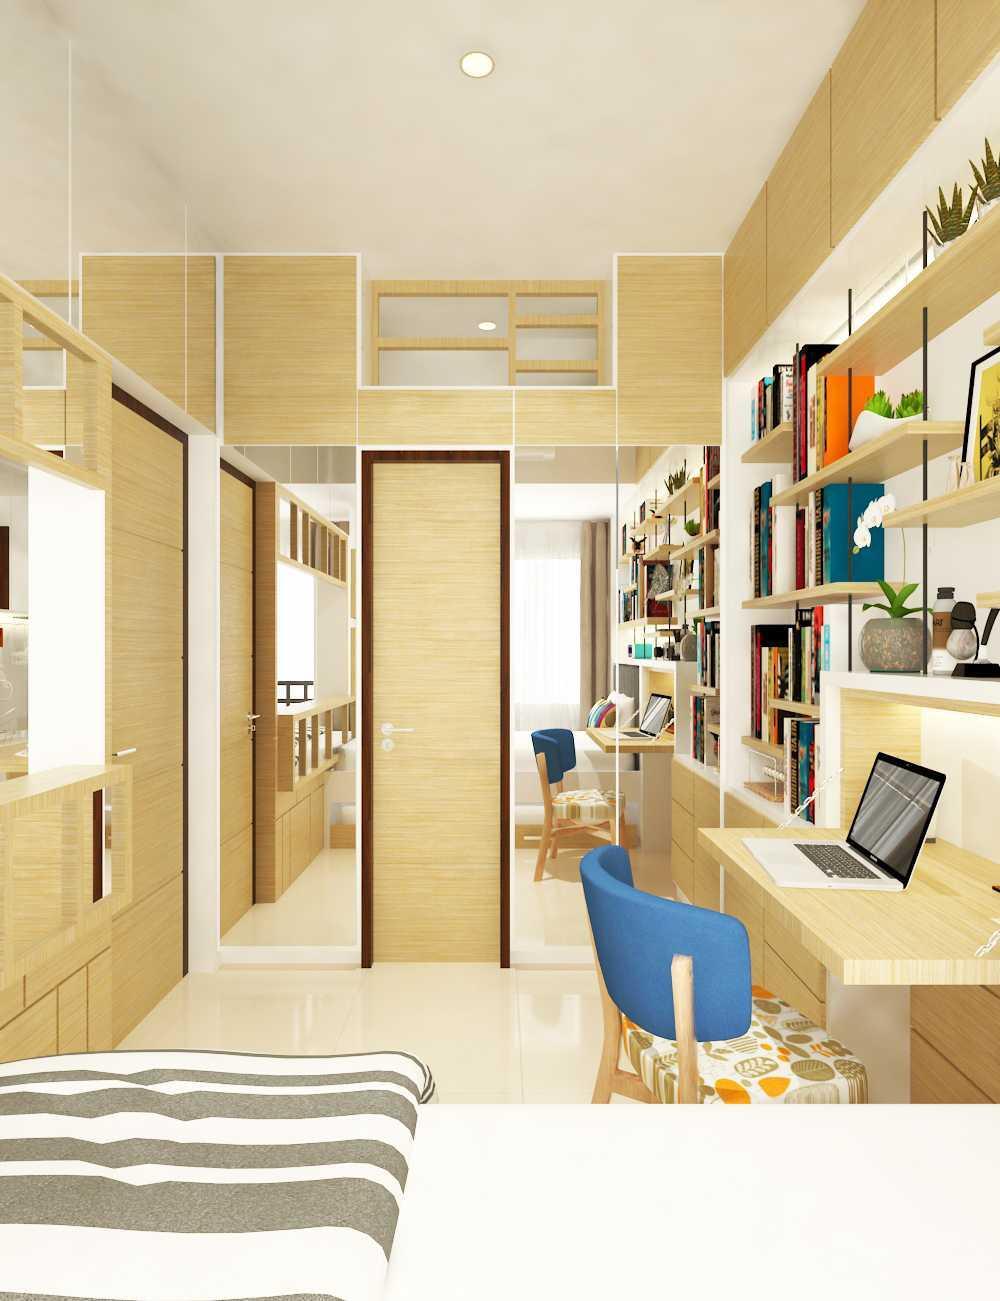 Miv Architects (Ar. Muhammad Ikhsan Hamiru, Iai & Partners) Interior Design Of Apartment Unit Makassar, South Sulawesi, Indonesia Makassar, South Sulawesi, Indonesia Apartment Room Design Skandinavia  29145